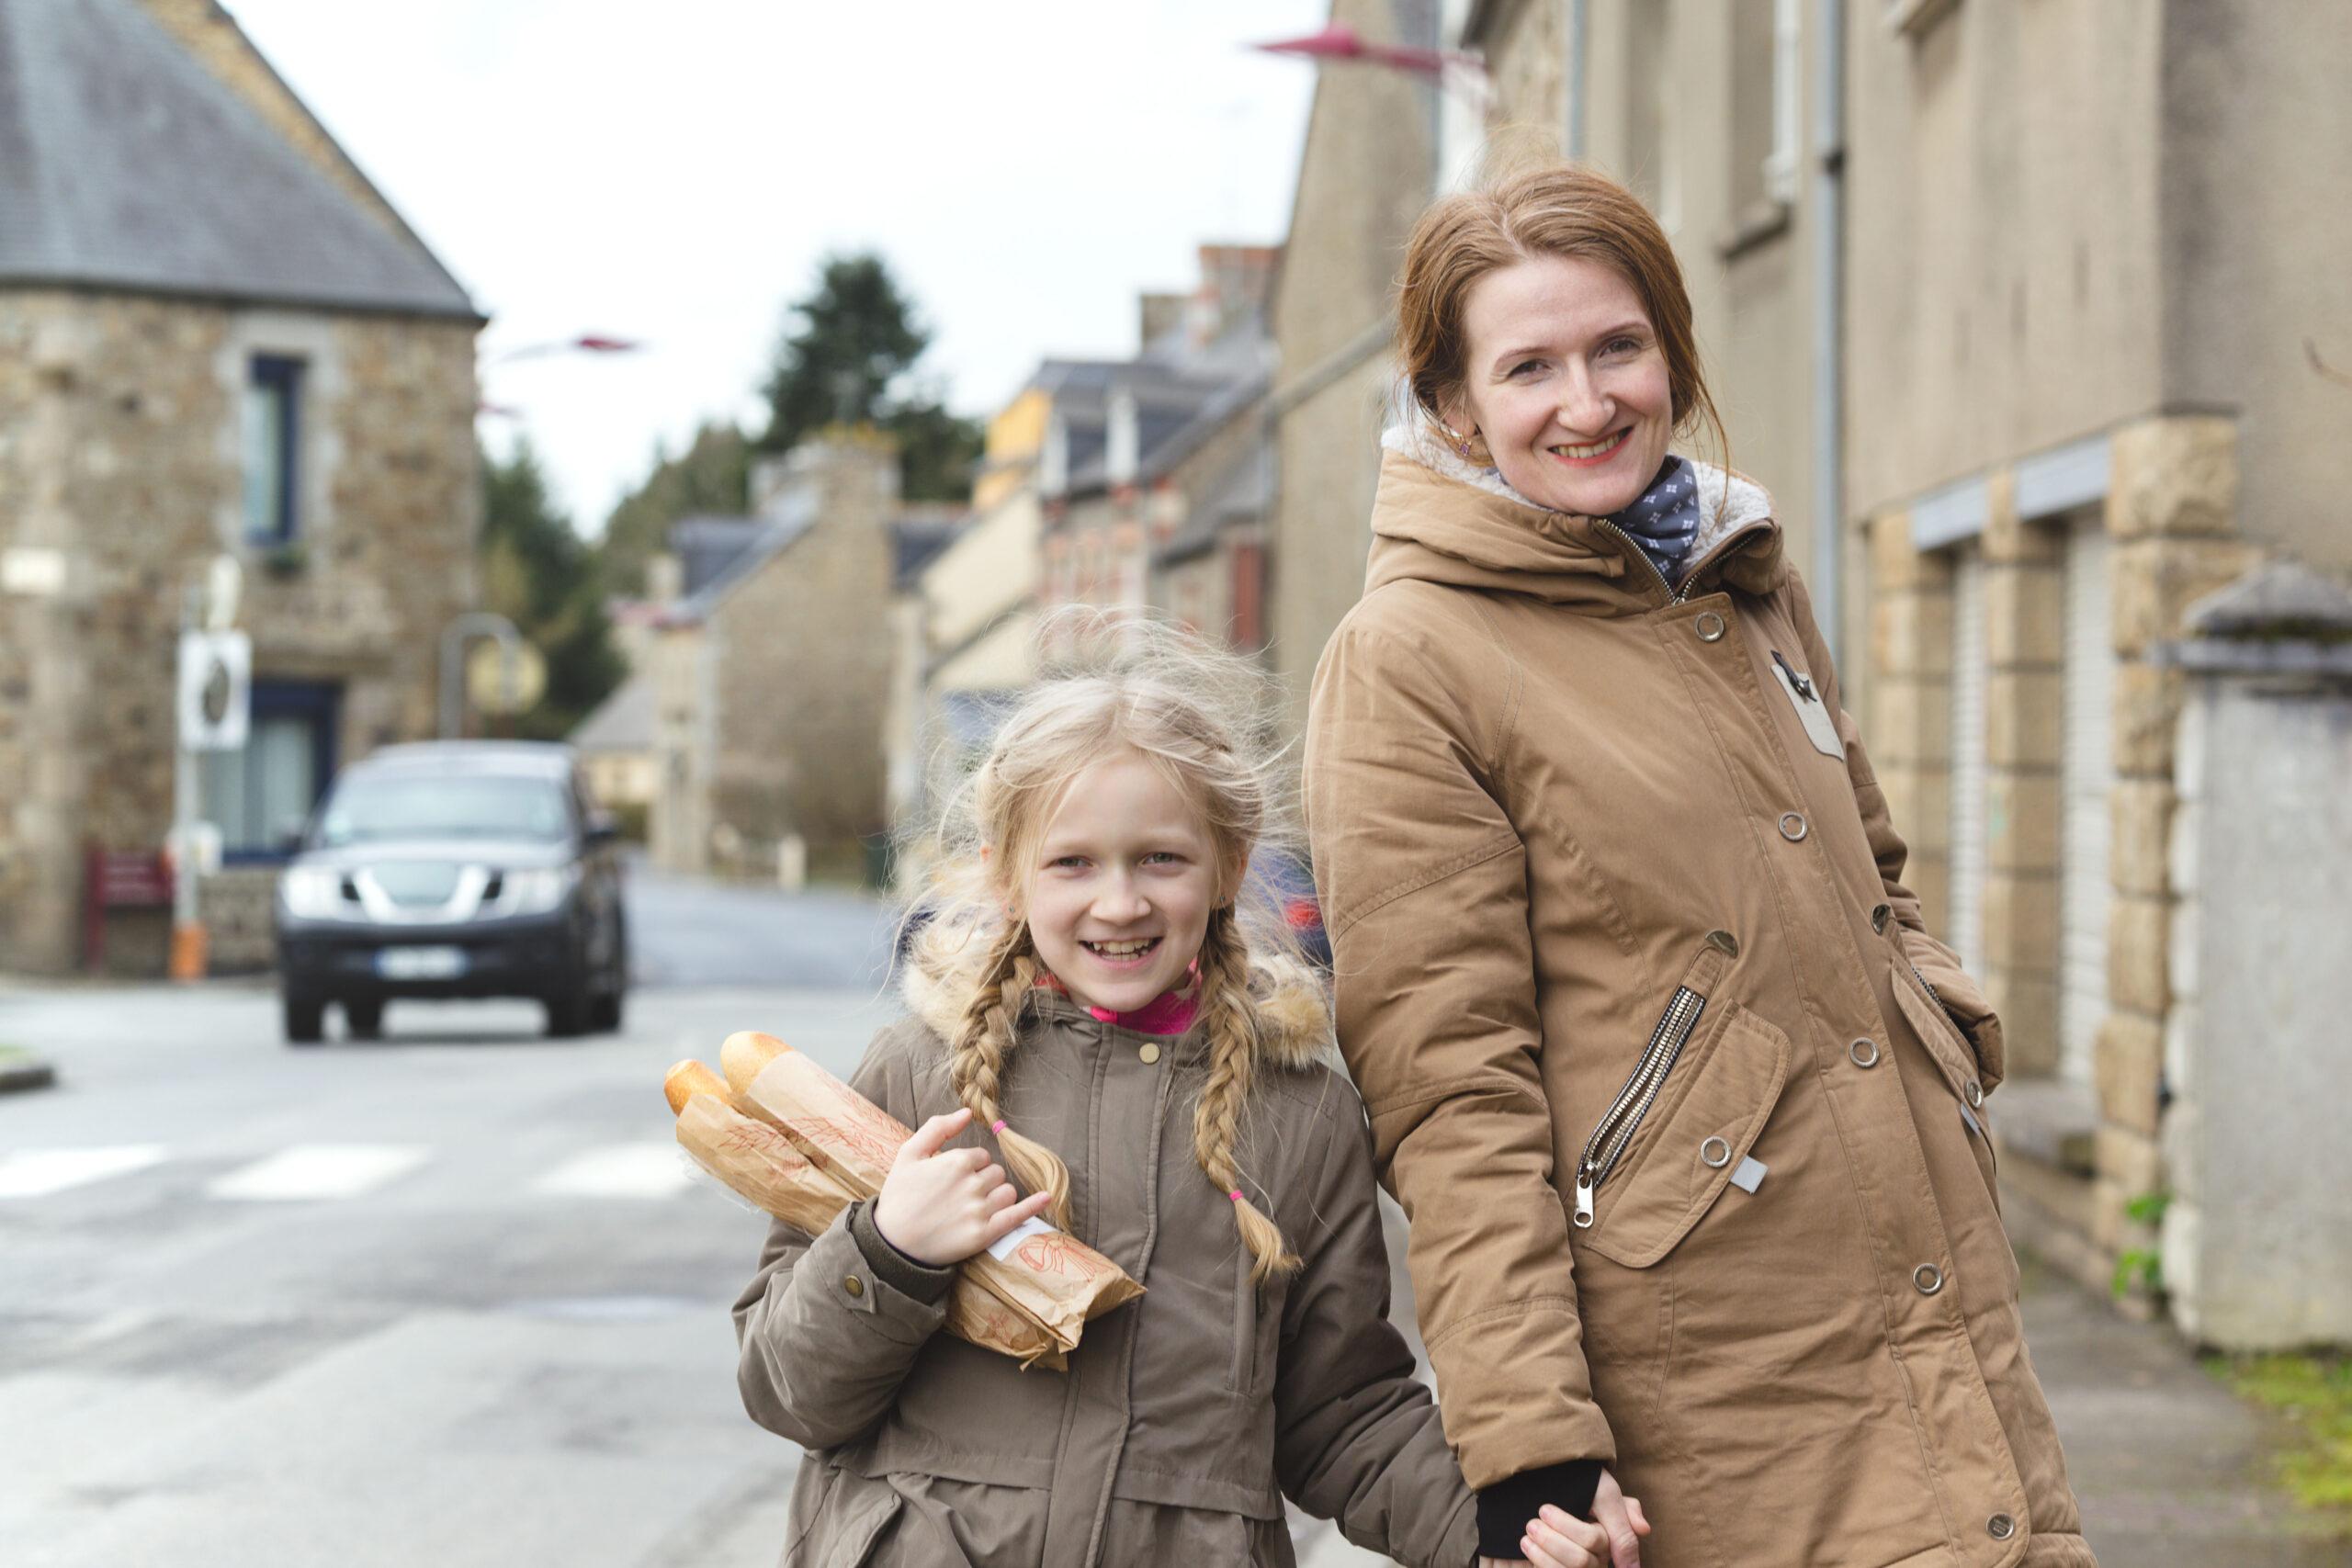 fransk Frankrike lokale mennesker lokalbefolkning Paris